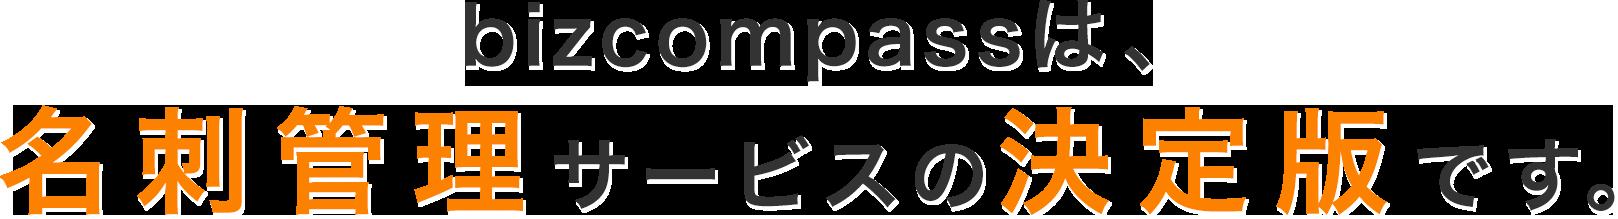 bizcompassは、名刺管理の決定版です。